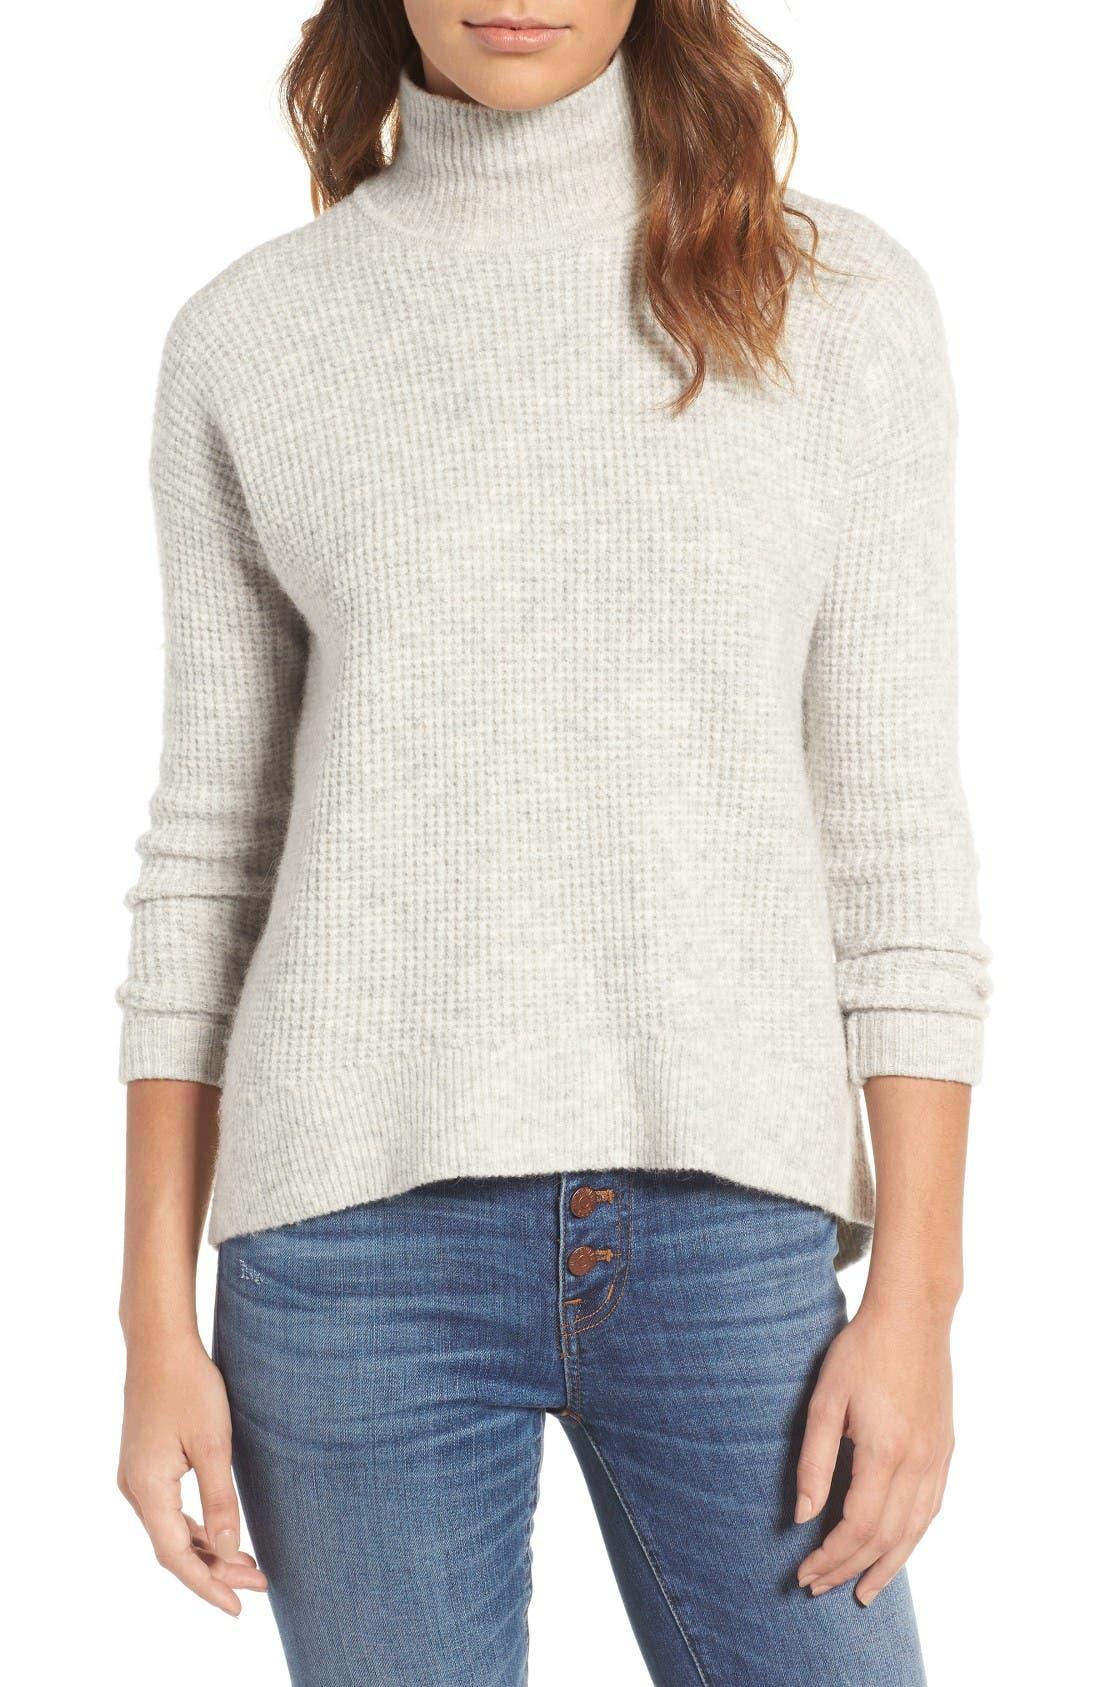 Main Image - Madewell Wafflestitch Turtleneck Sweater